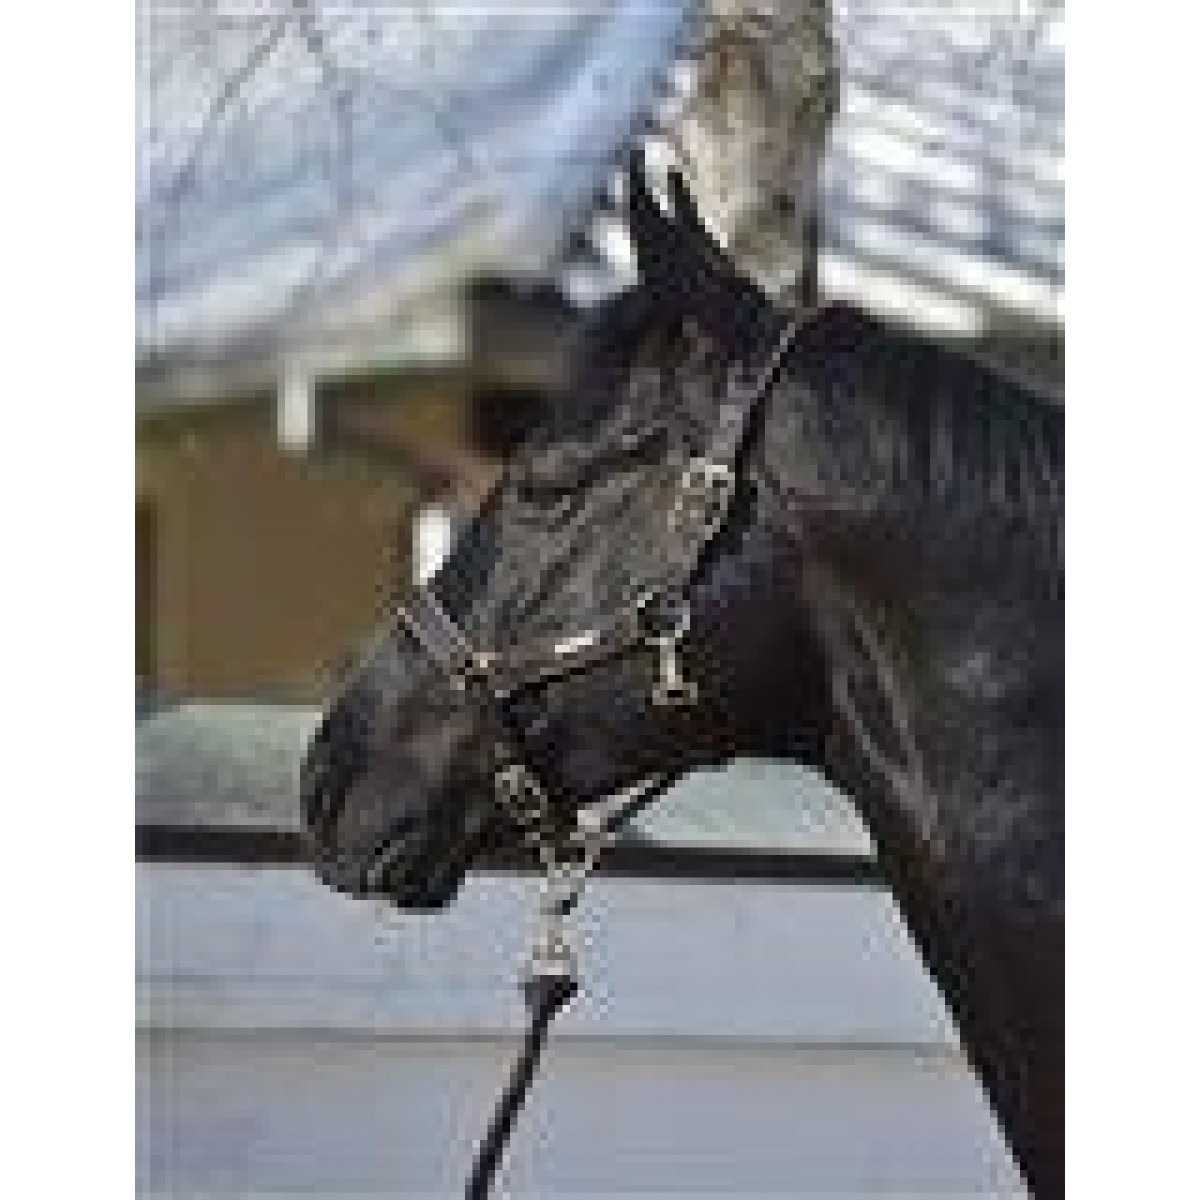 Rider by Horse Platinum Grime